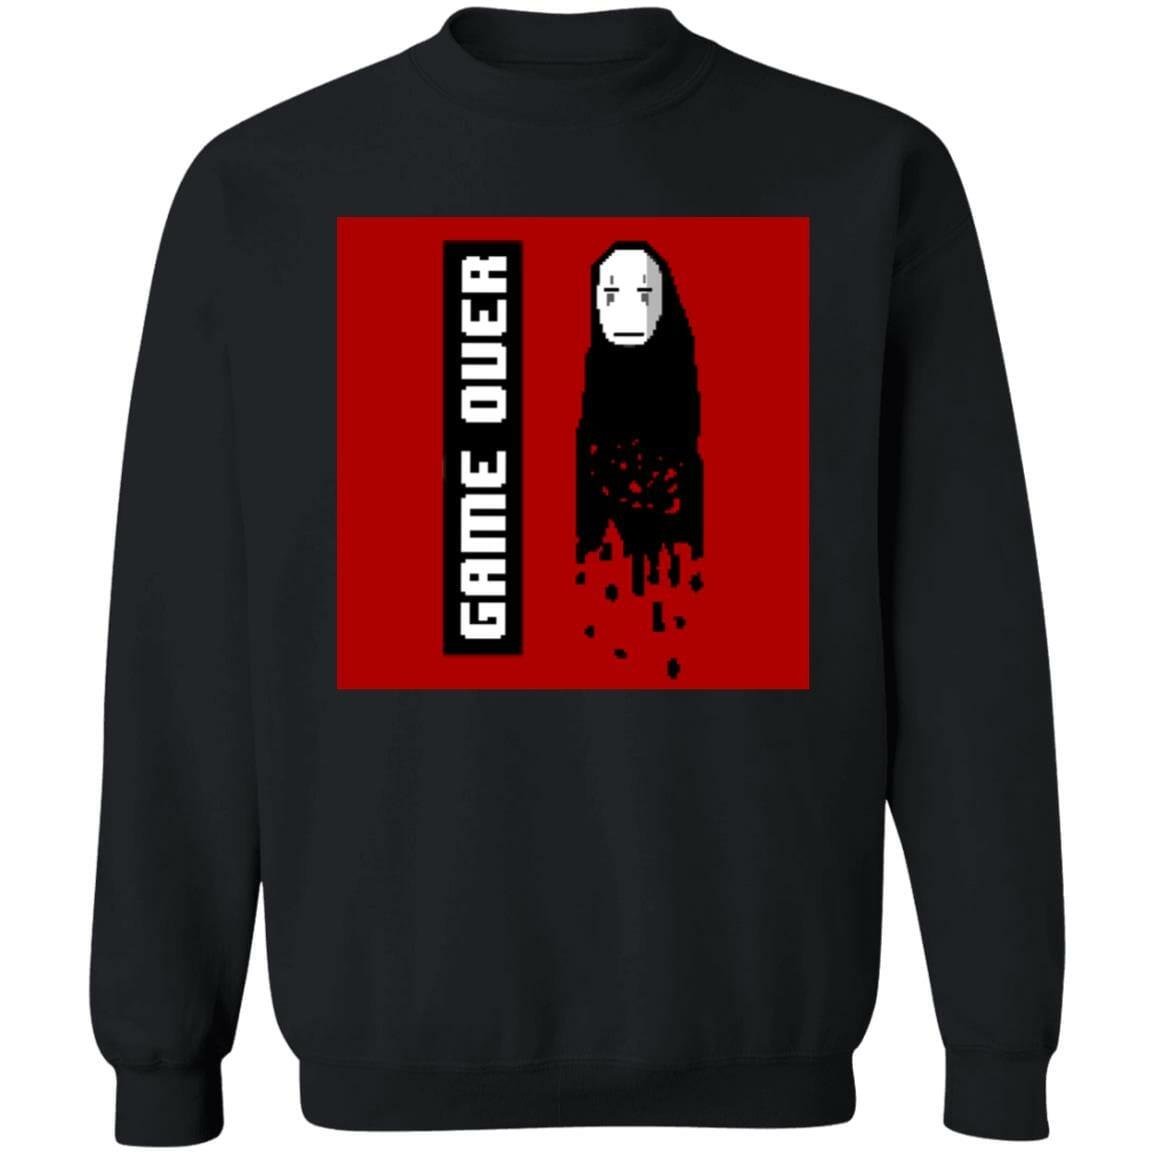 Spirited Away No Face 8 BIT Game Over Sweatshirt